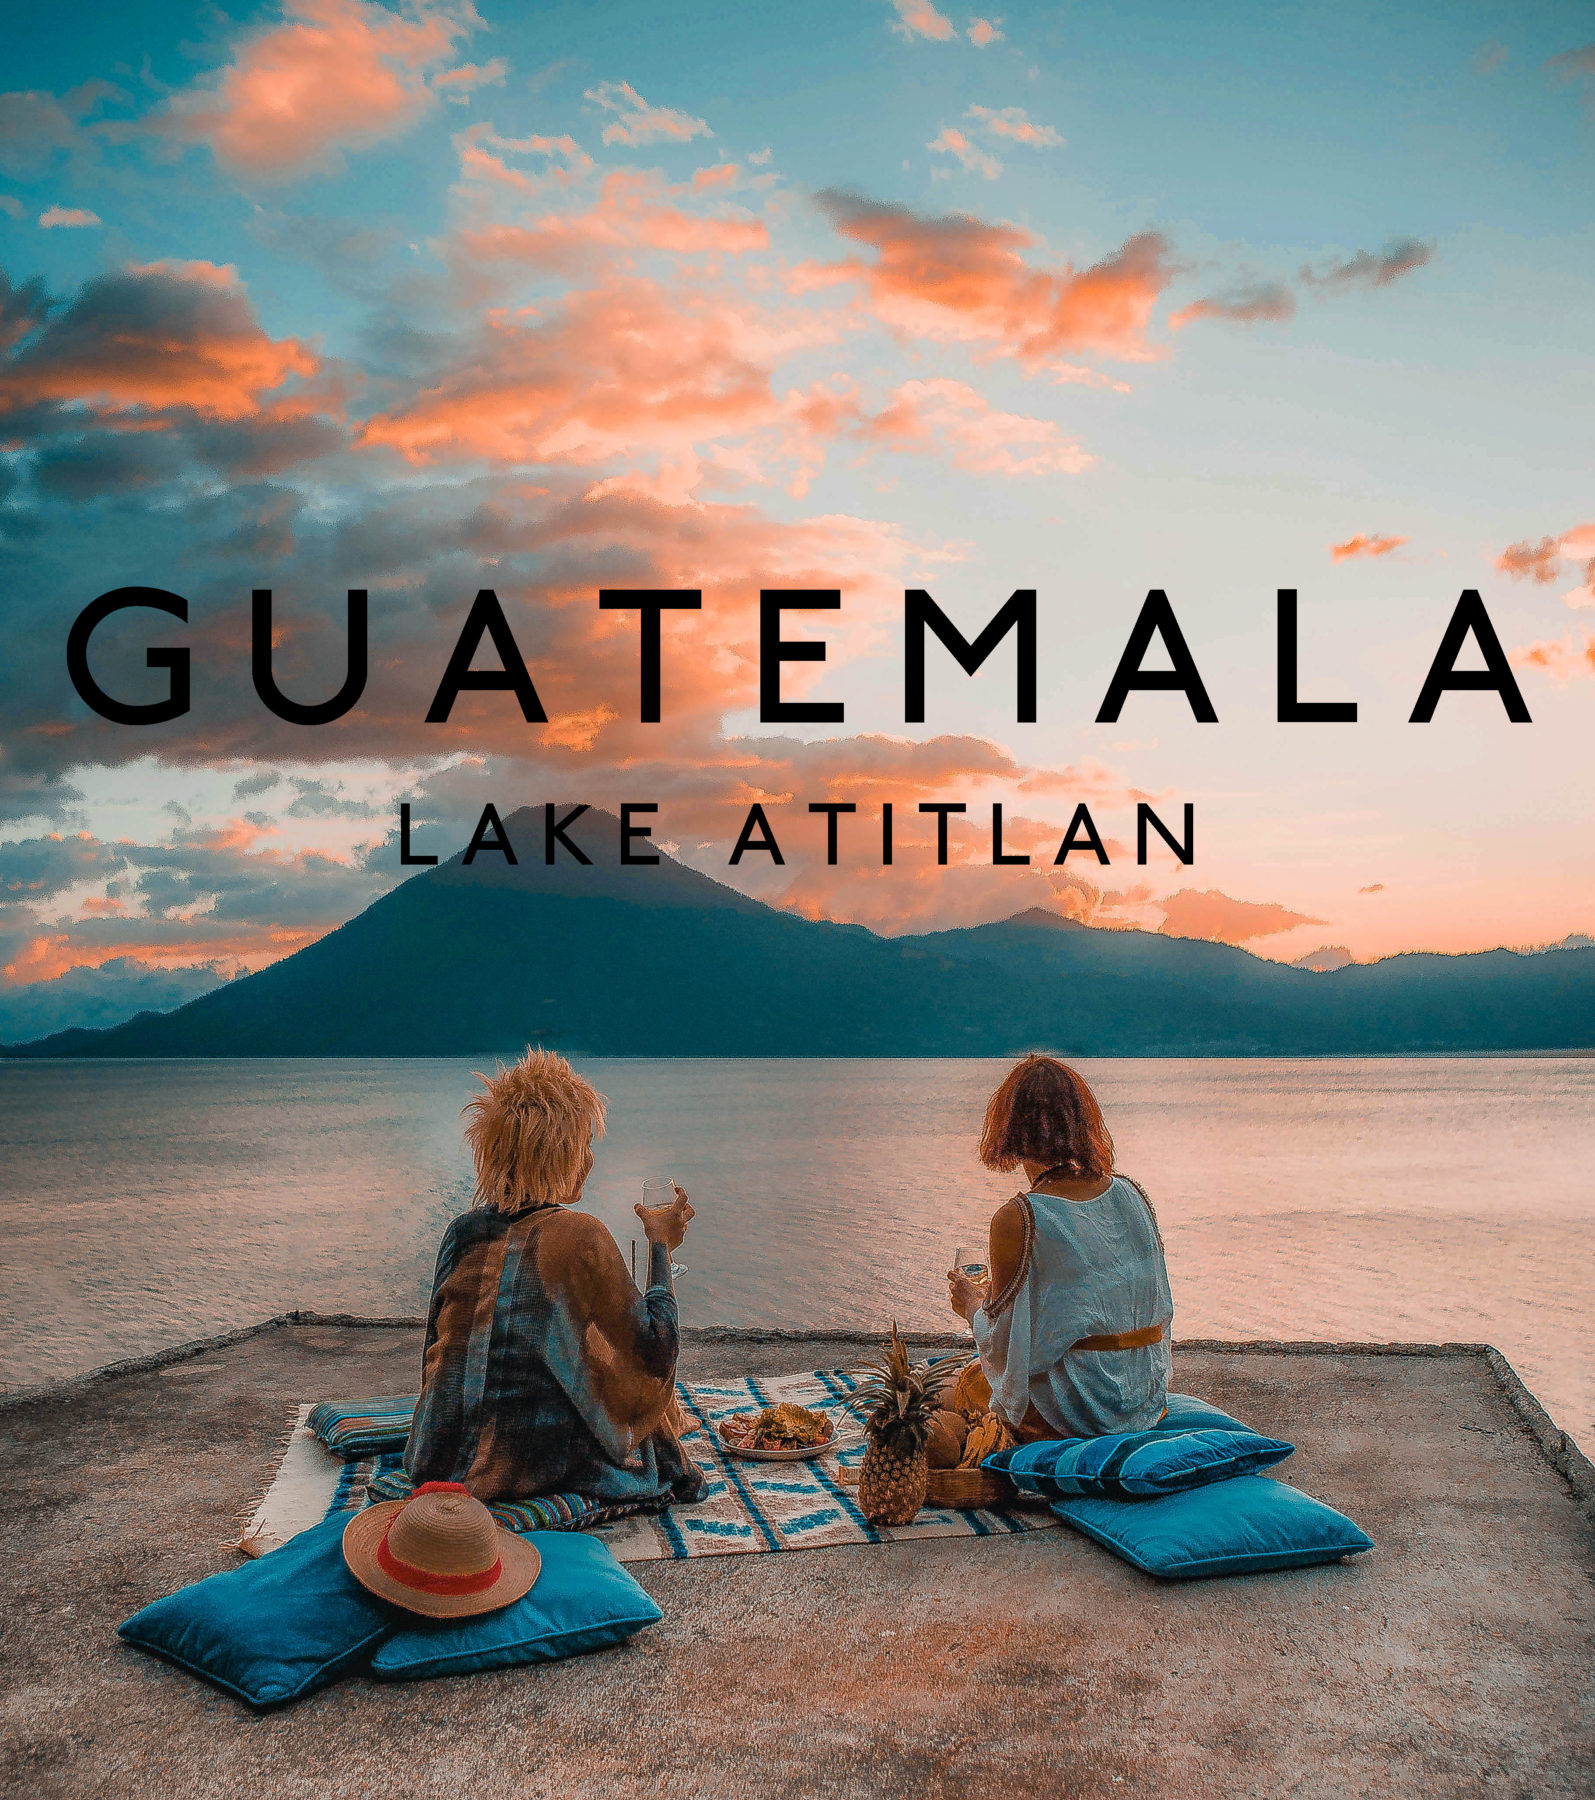 guatemala lake atitlan lago central america most beautiful lake in the world